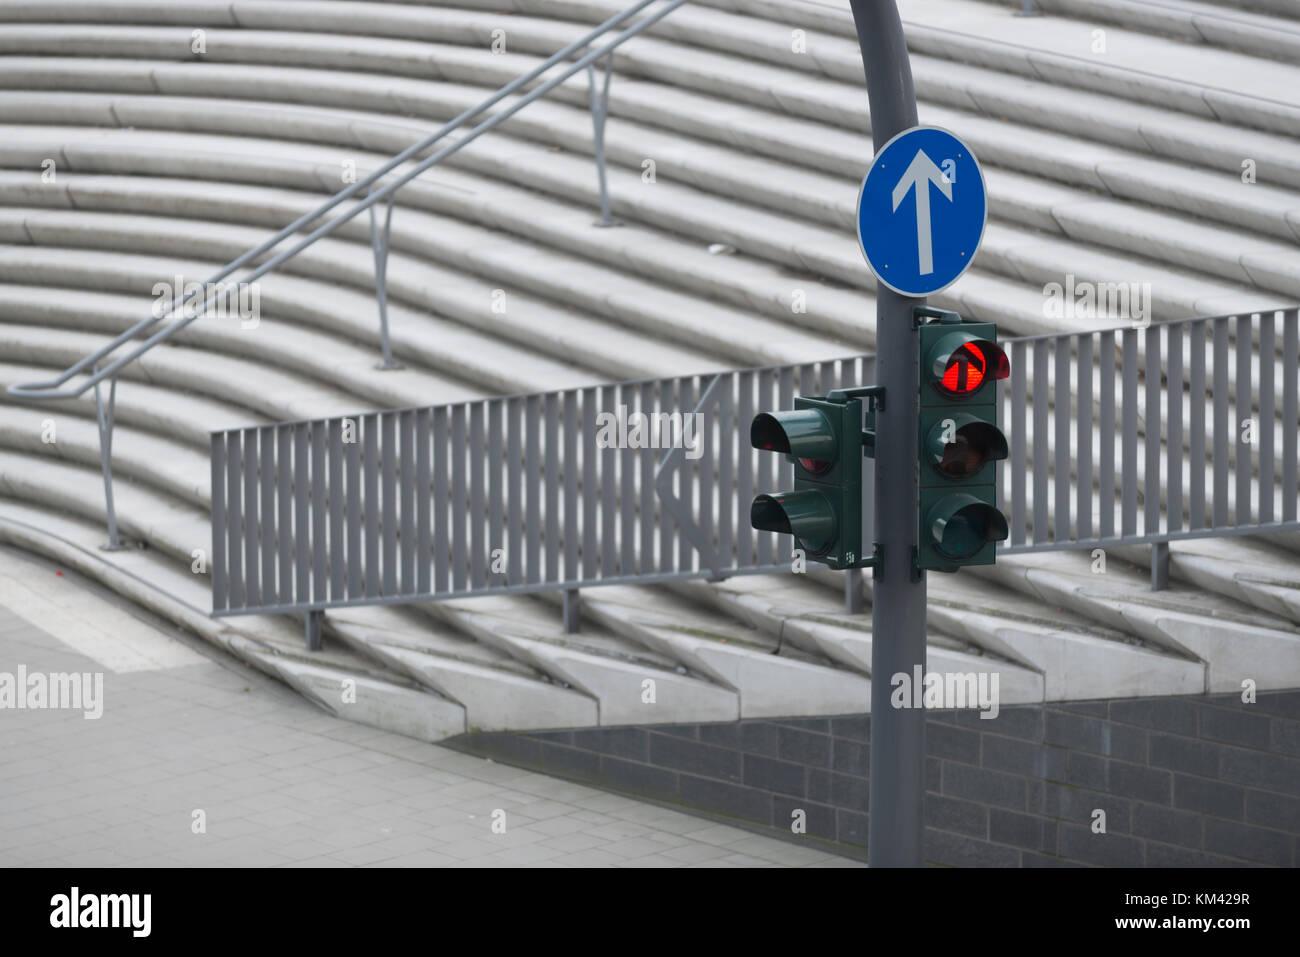 Ampel, Straßenverkehr - Stock Image